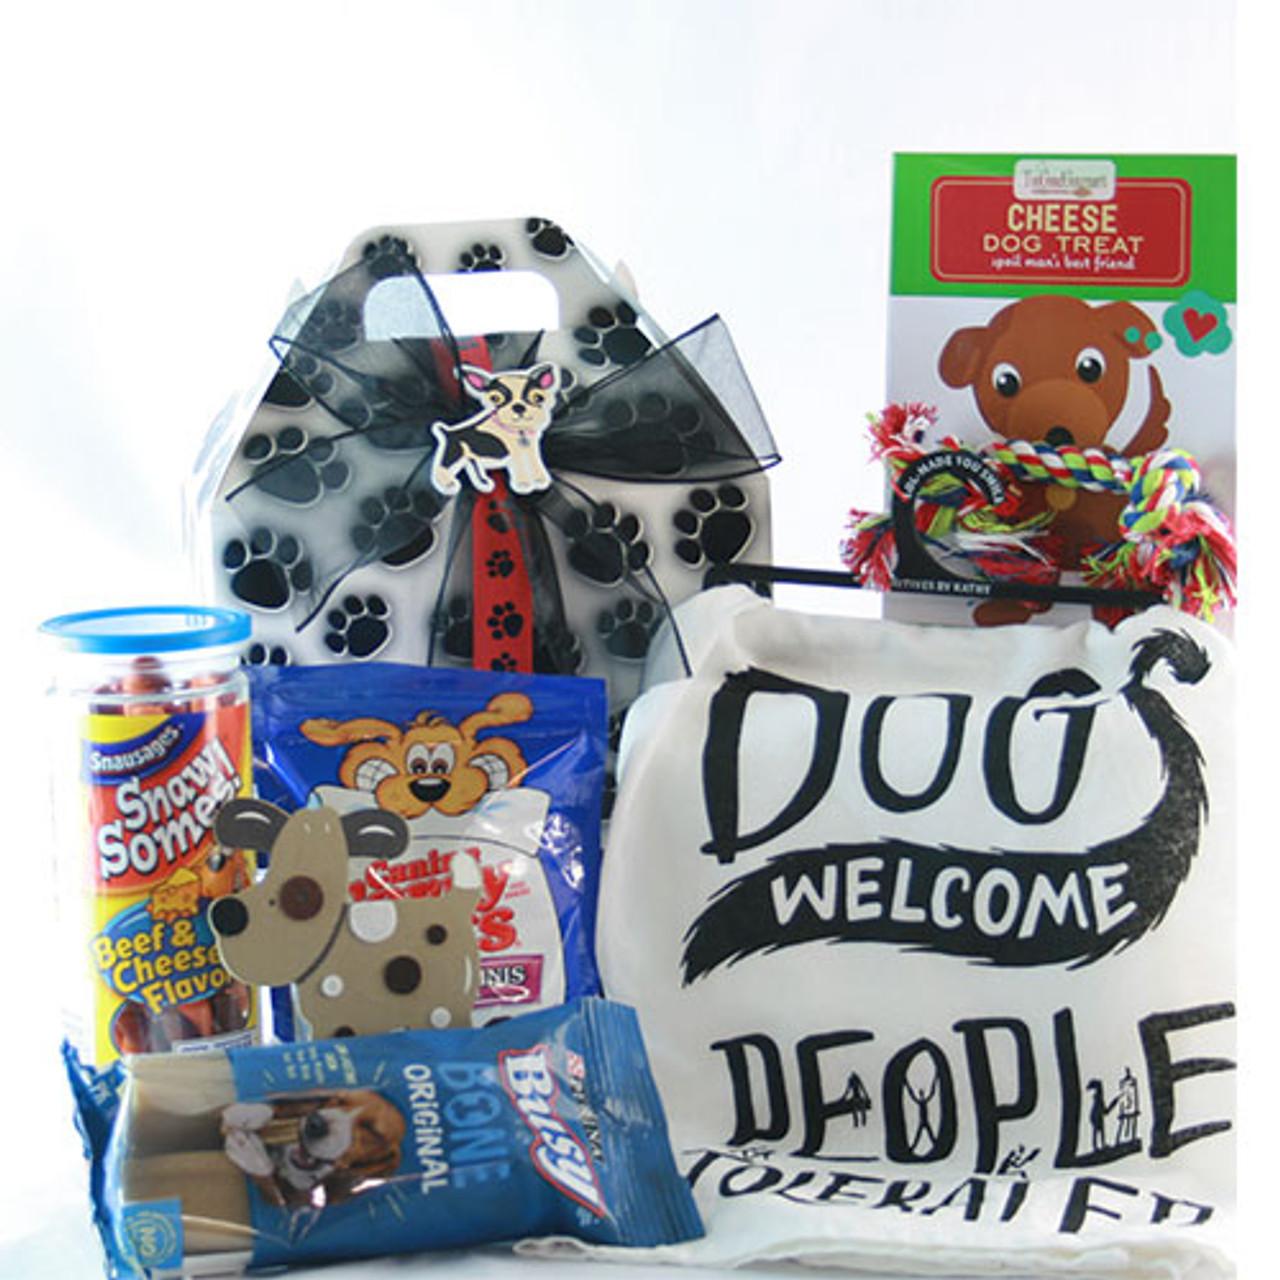 Image 0 of Man's Best Friend: Pet Dog Gift Basket